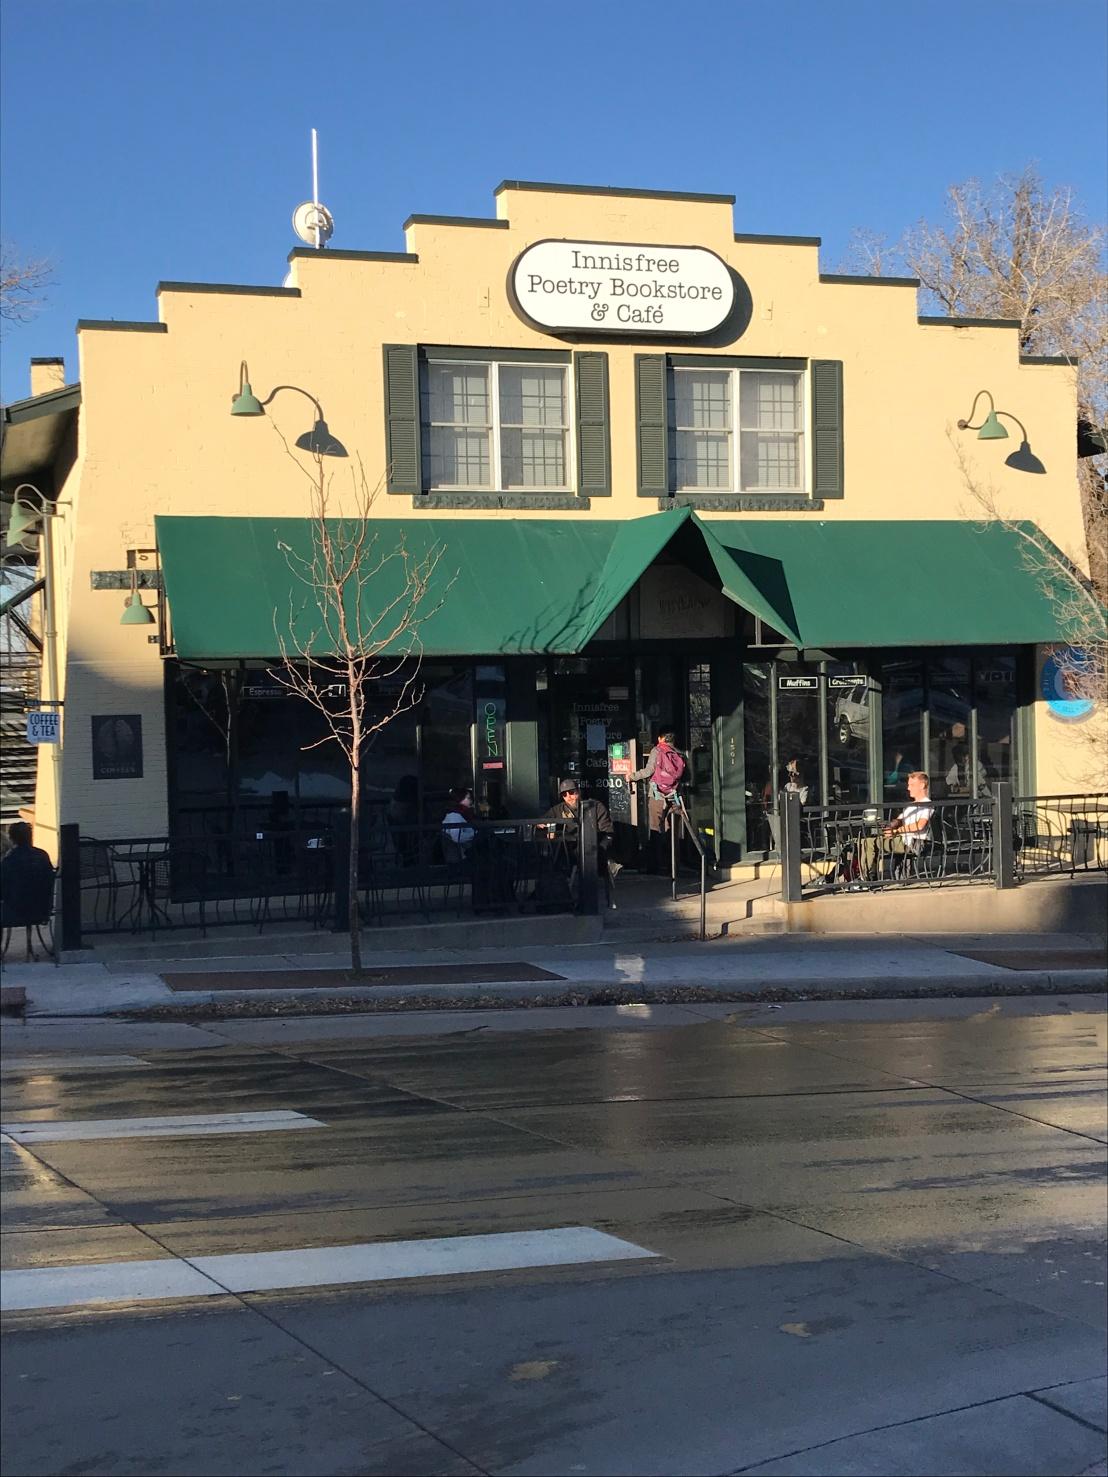 Innisfree Poetry Bookstore & Café(CO)